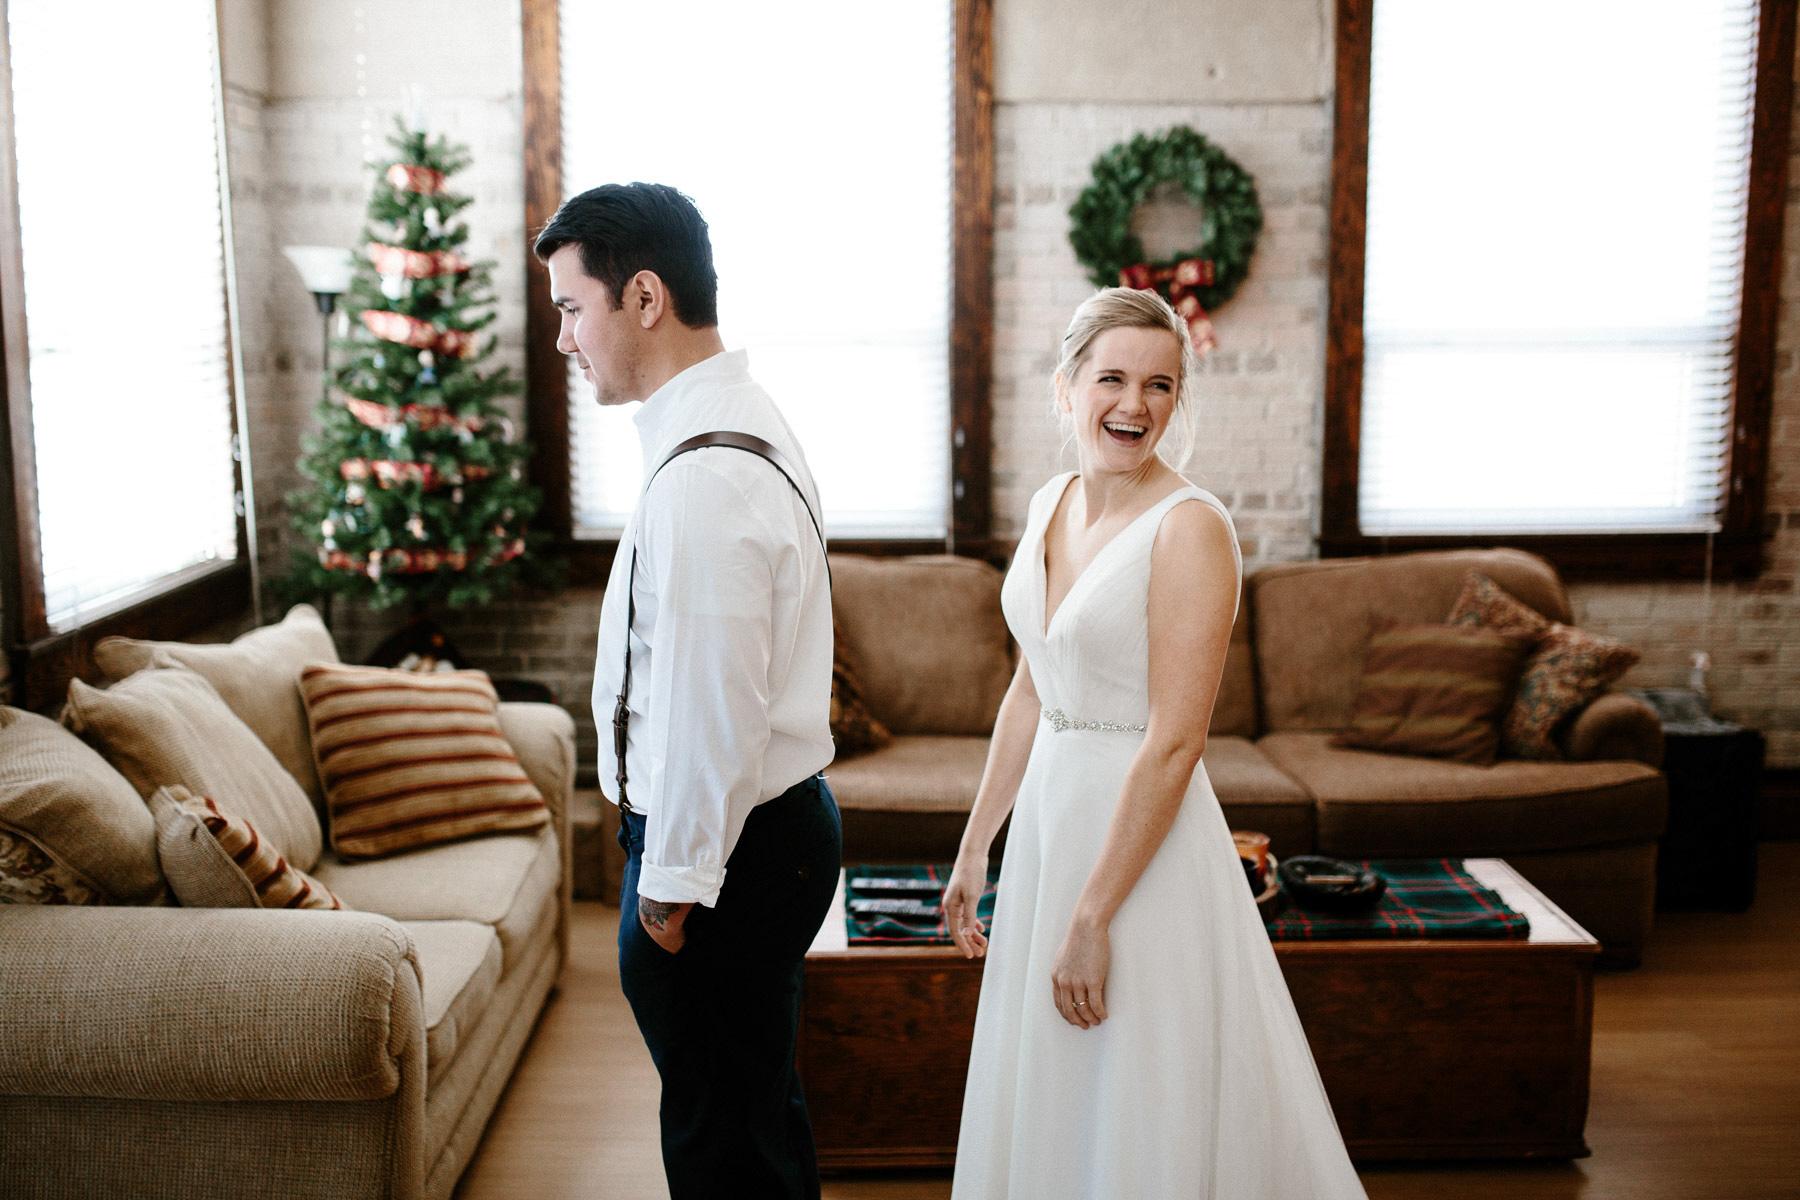 sioux-falls-black-hills-rapid-city-elopement-wedding-adventure-photographer-custer-sylvan-lake-14.jpg